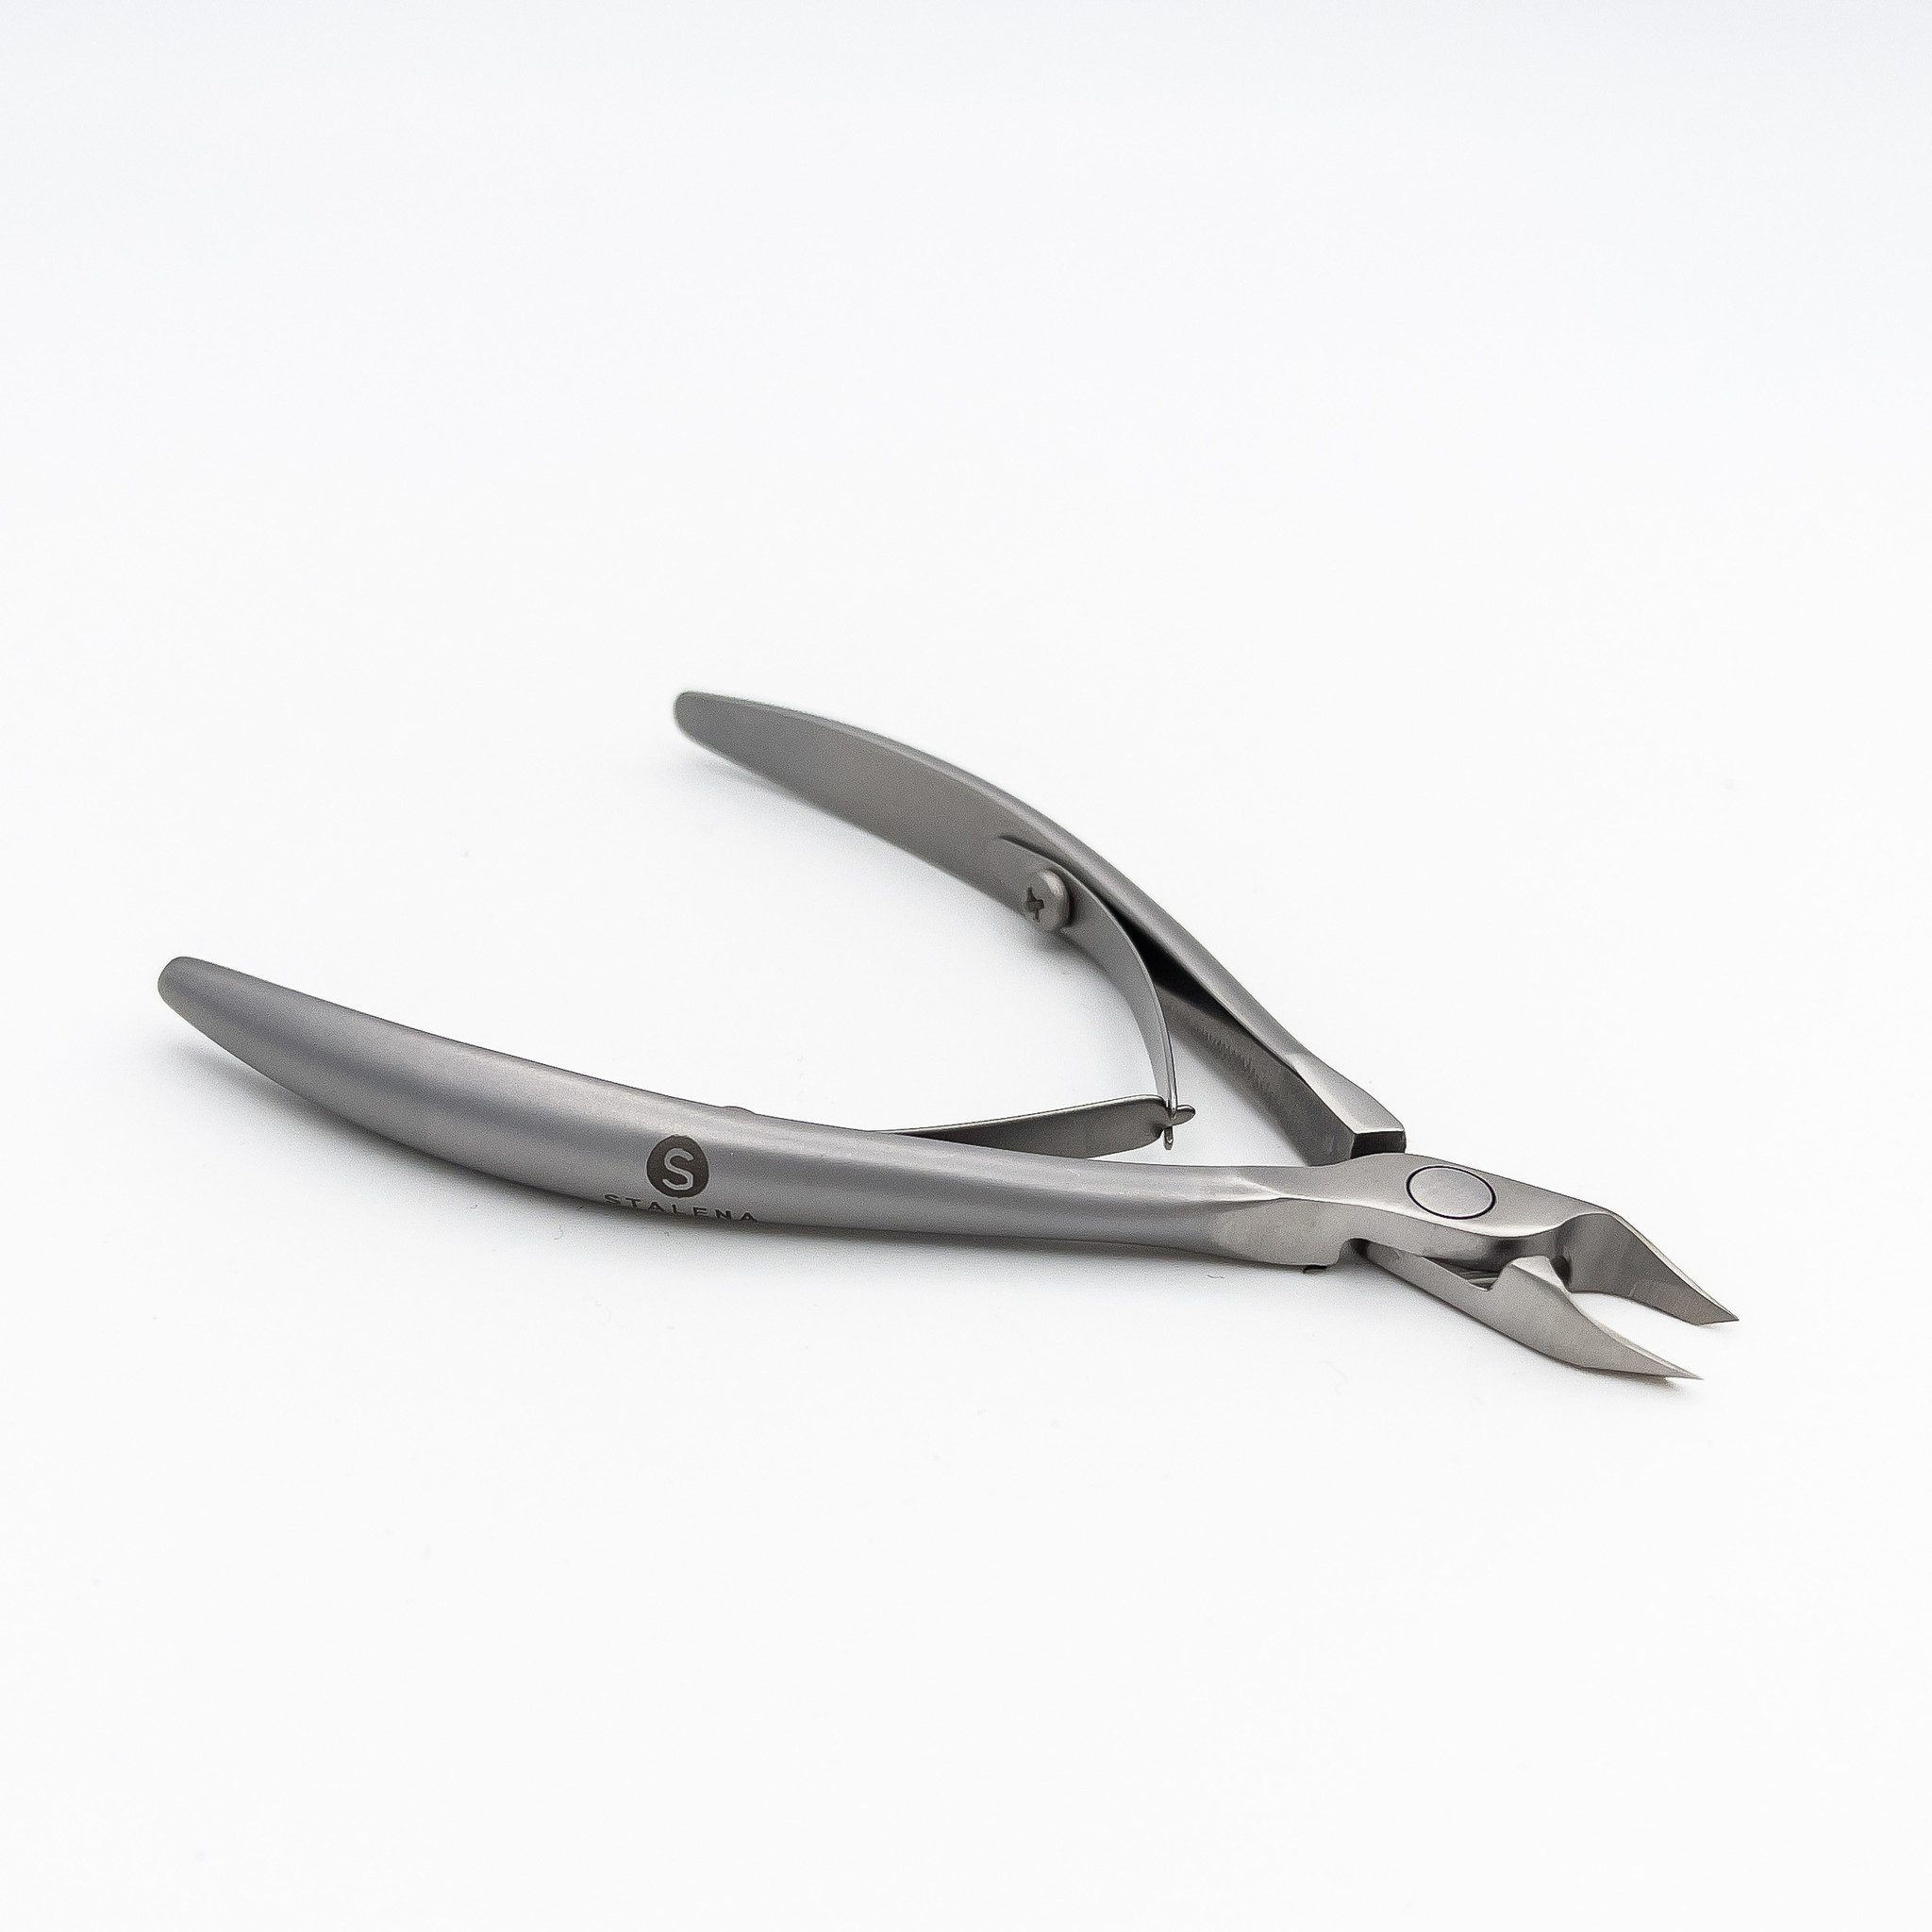 STALENA Vellentang 3 mm - lange handgreep KE-01 (N5-10-03)